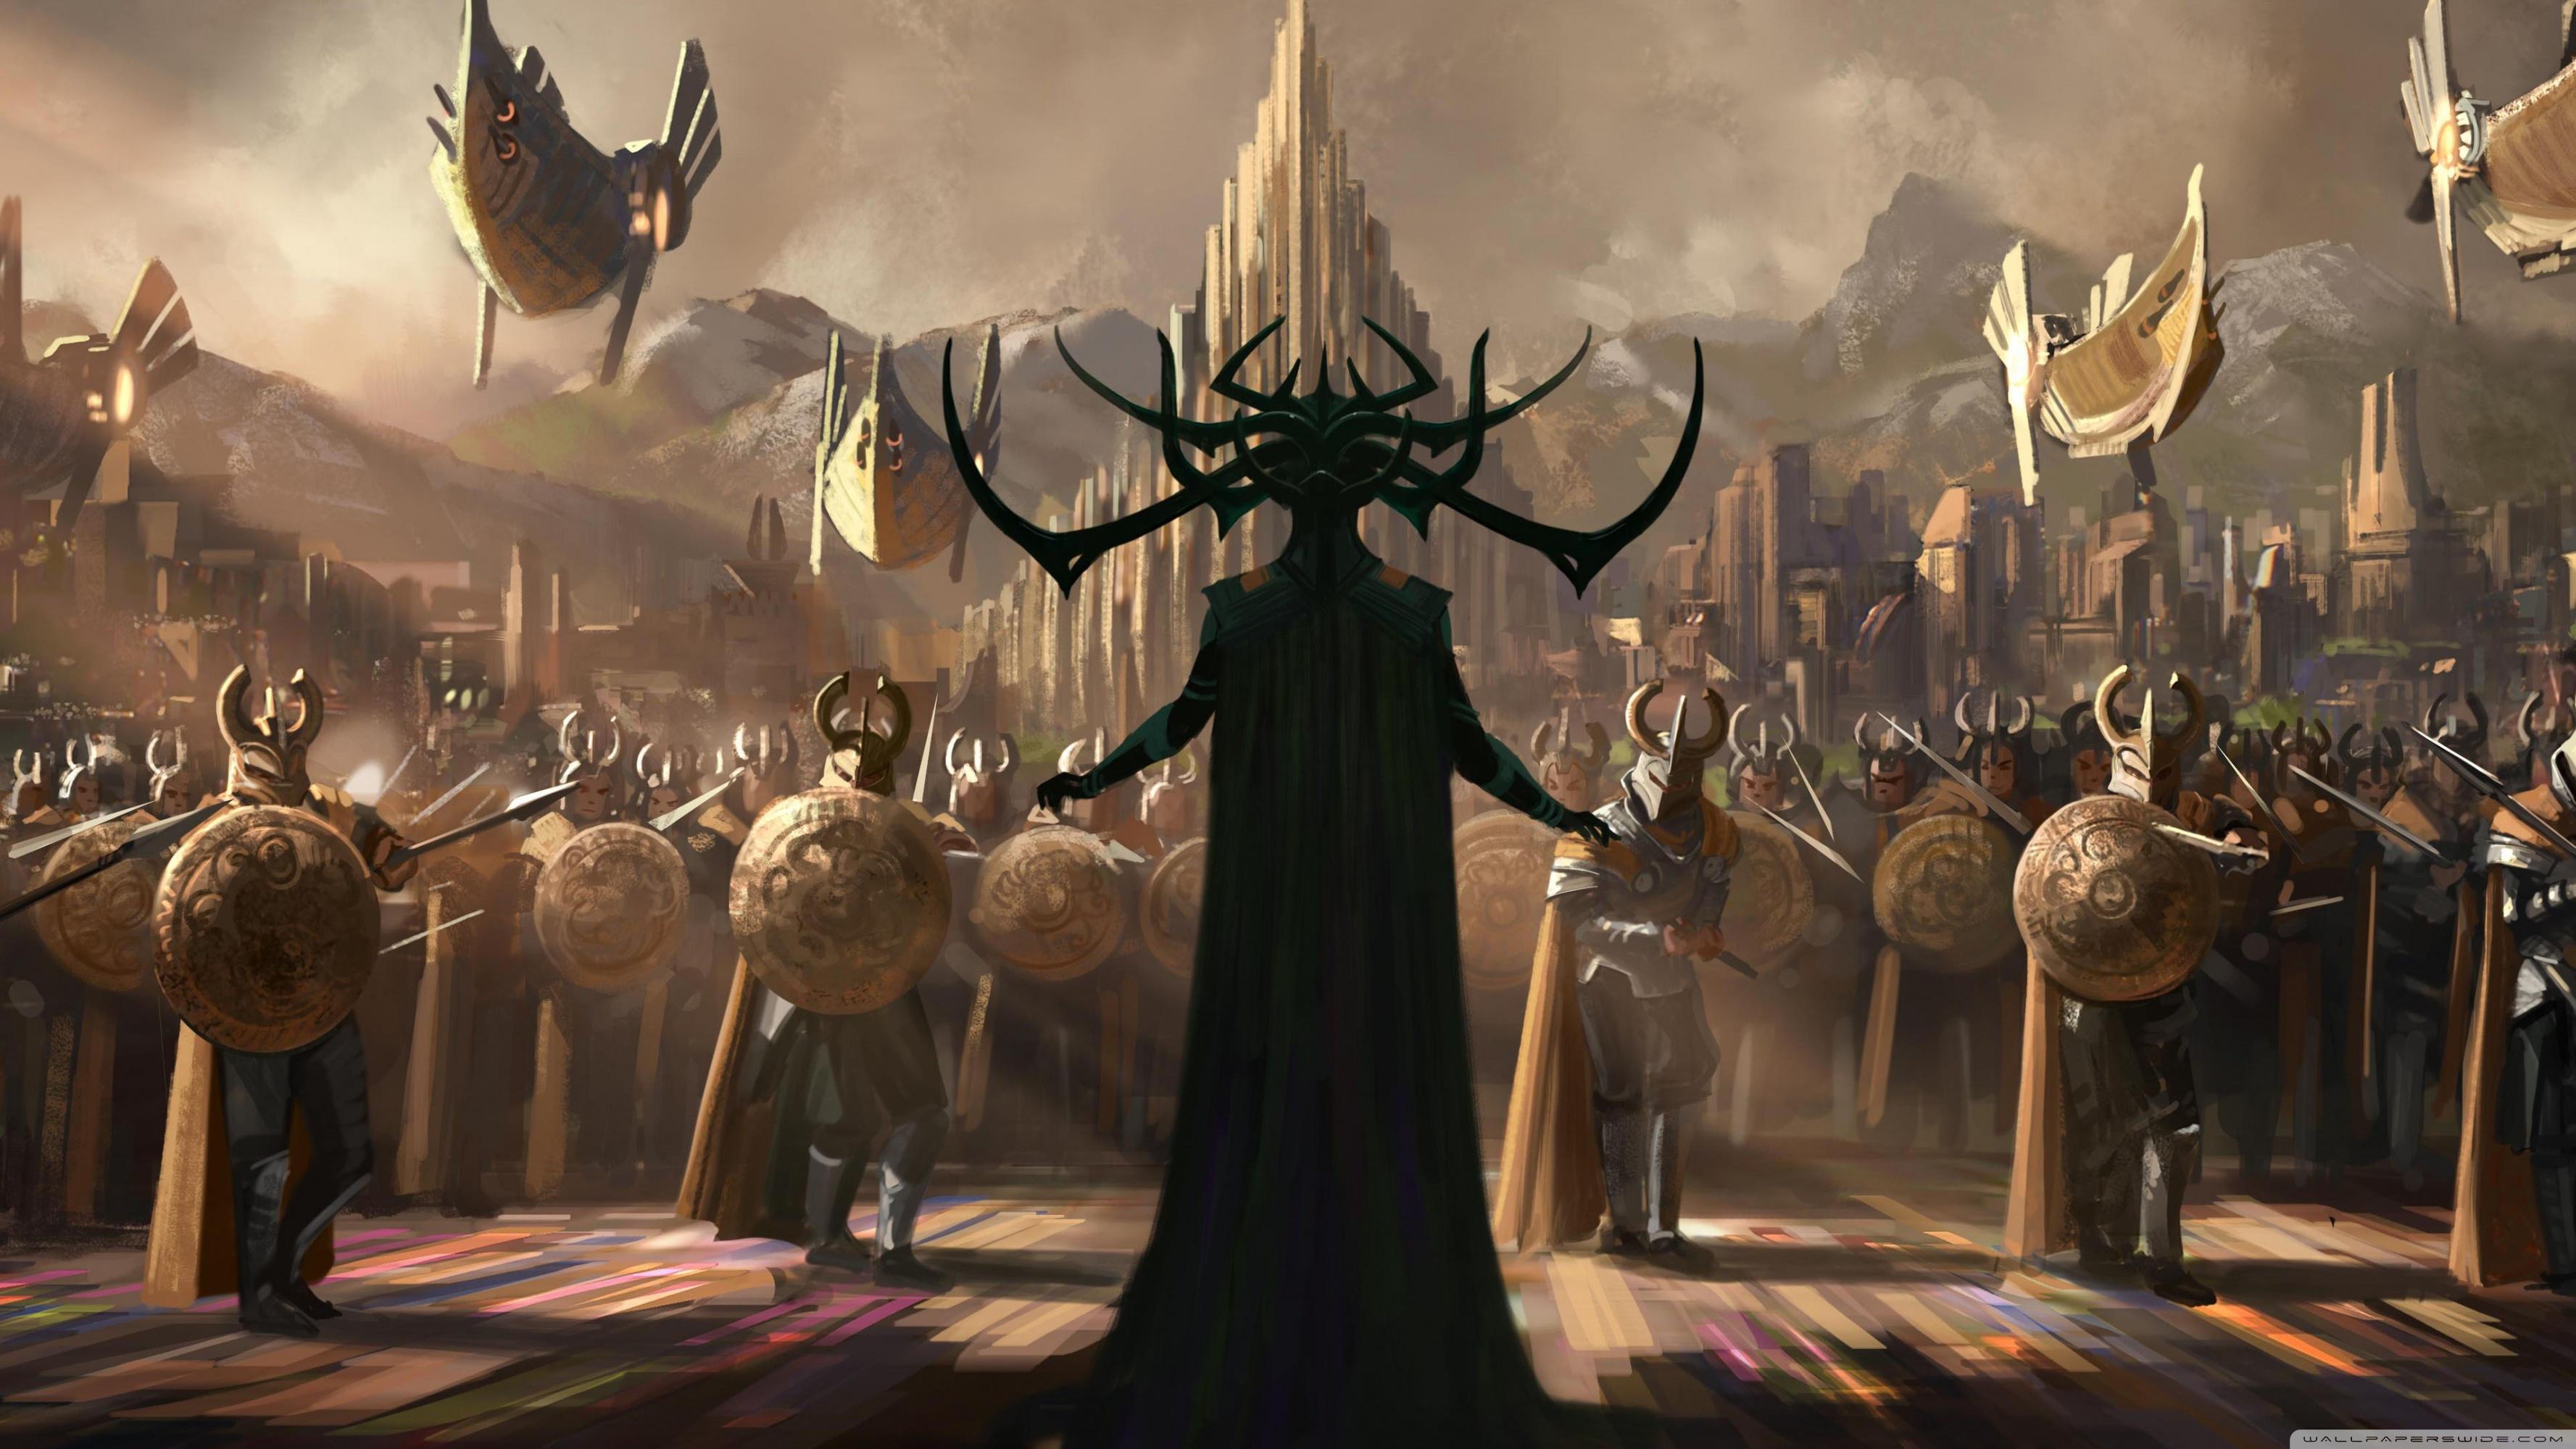 Thor Ragnarok Wallpaper 4k Posted By Ethan Johnson